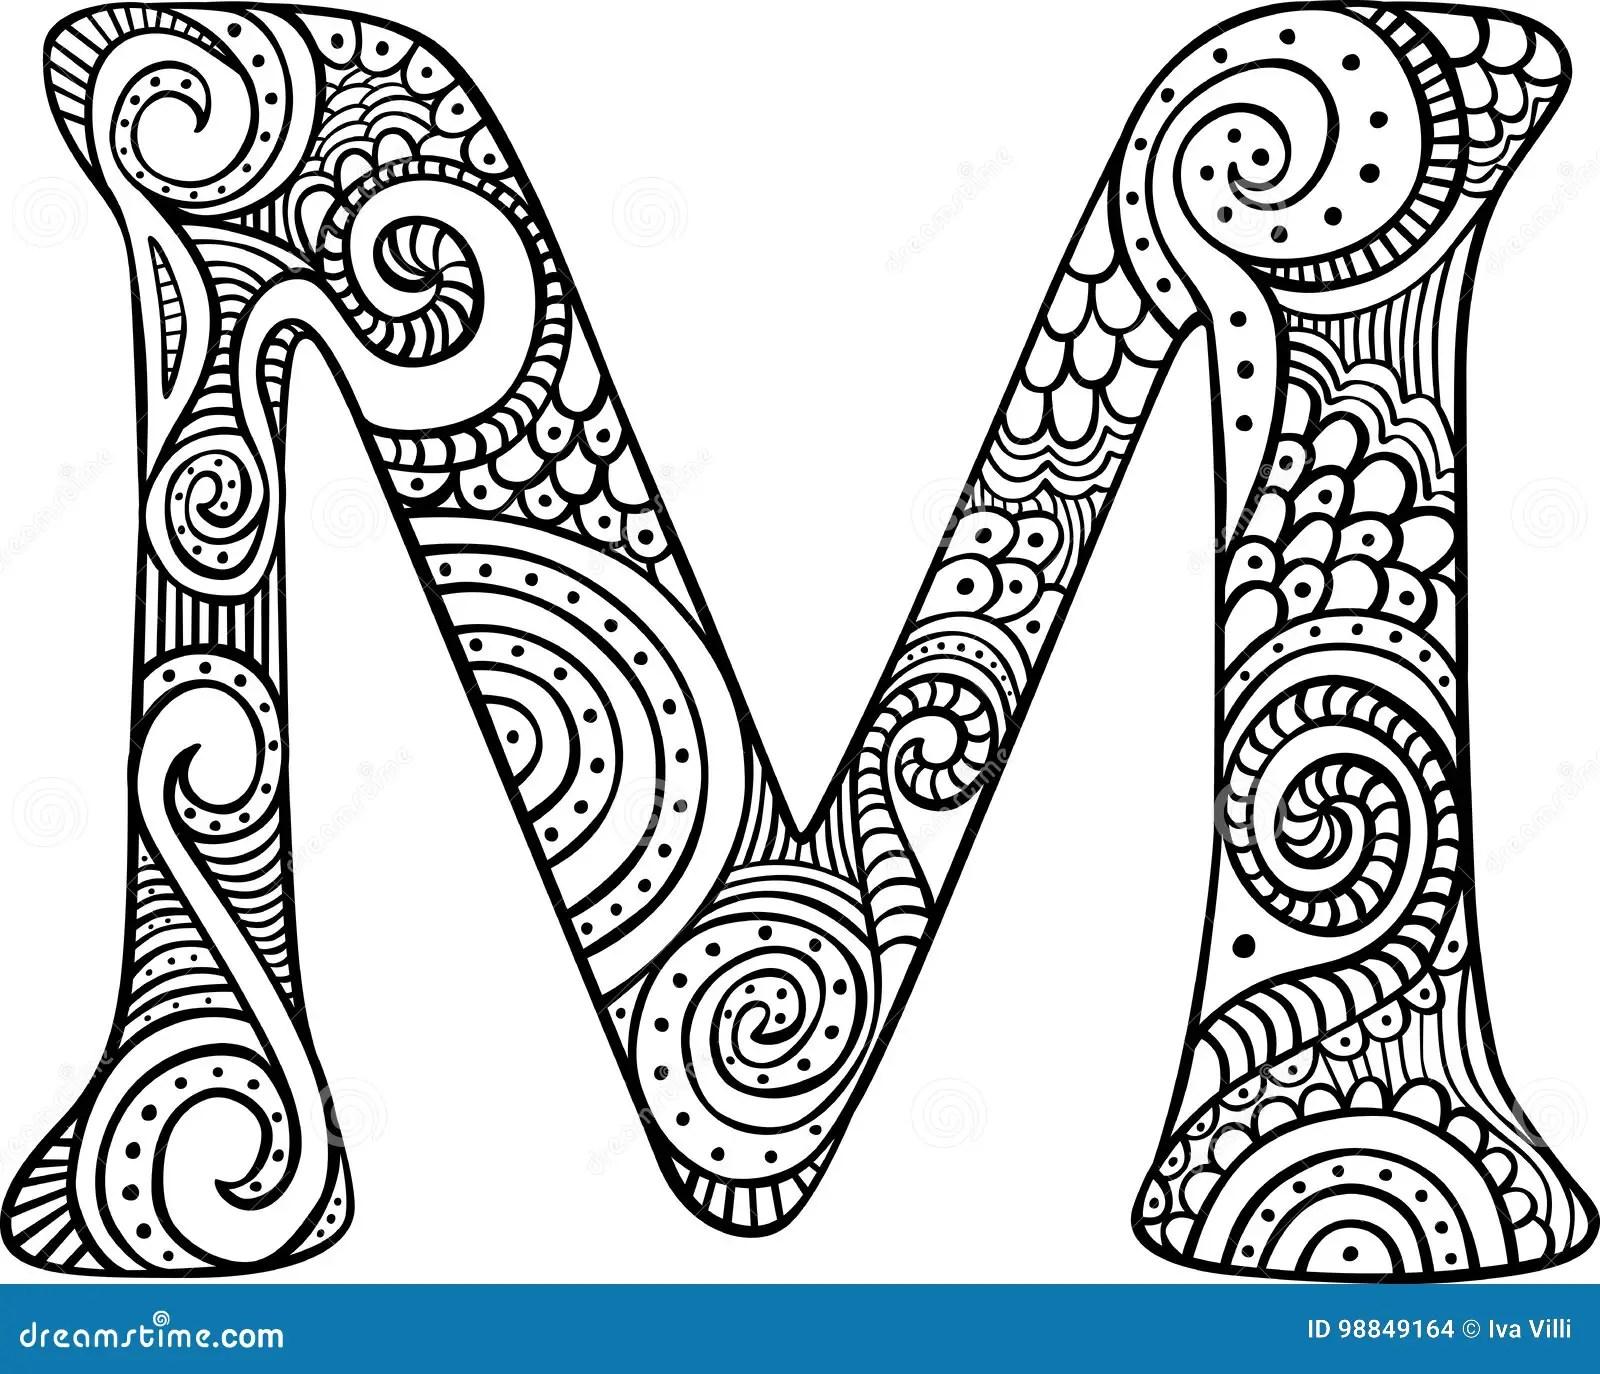 Illustrated Letter M Stock Vector Illustration Of Header